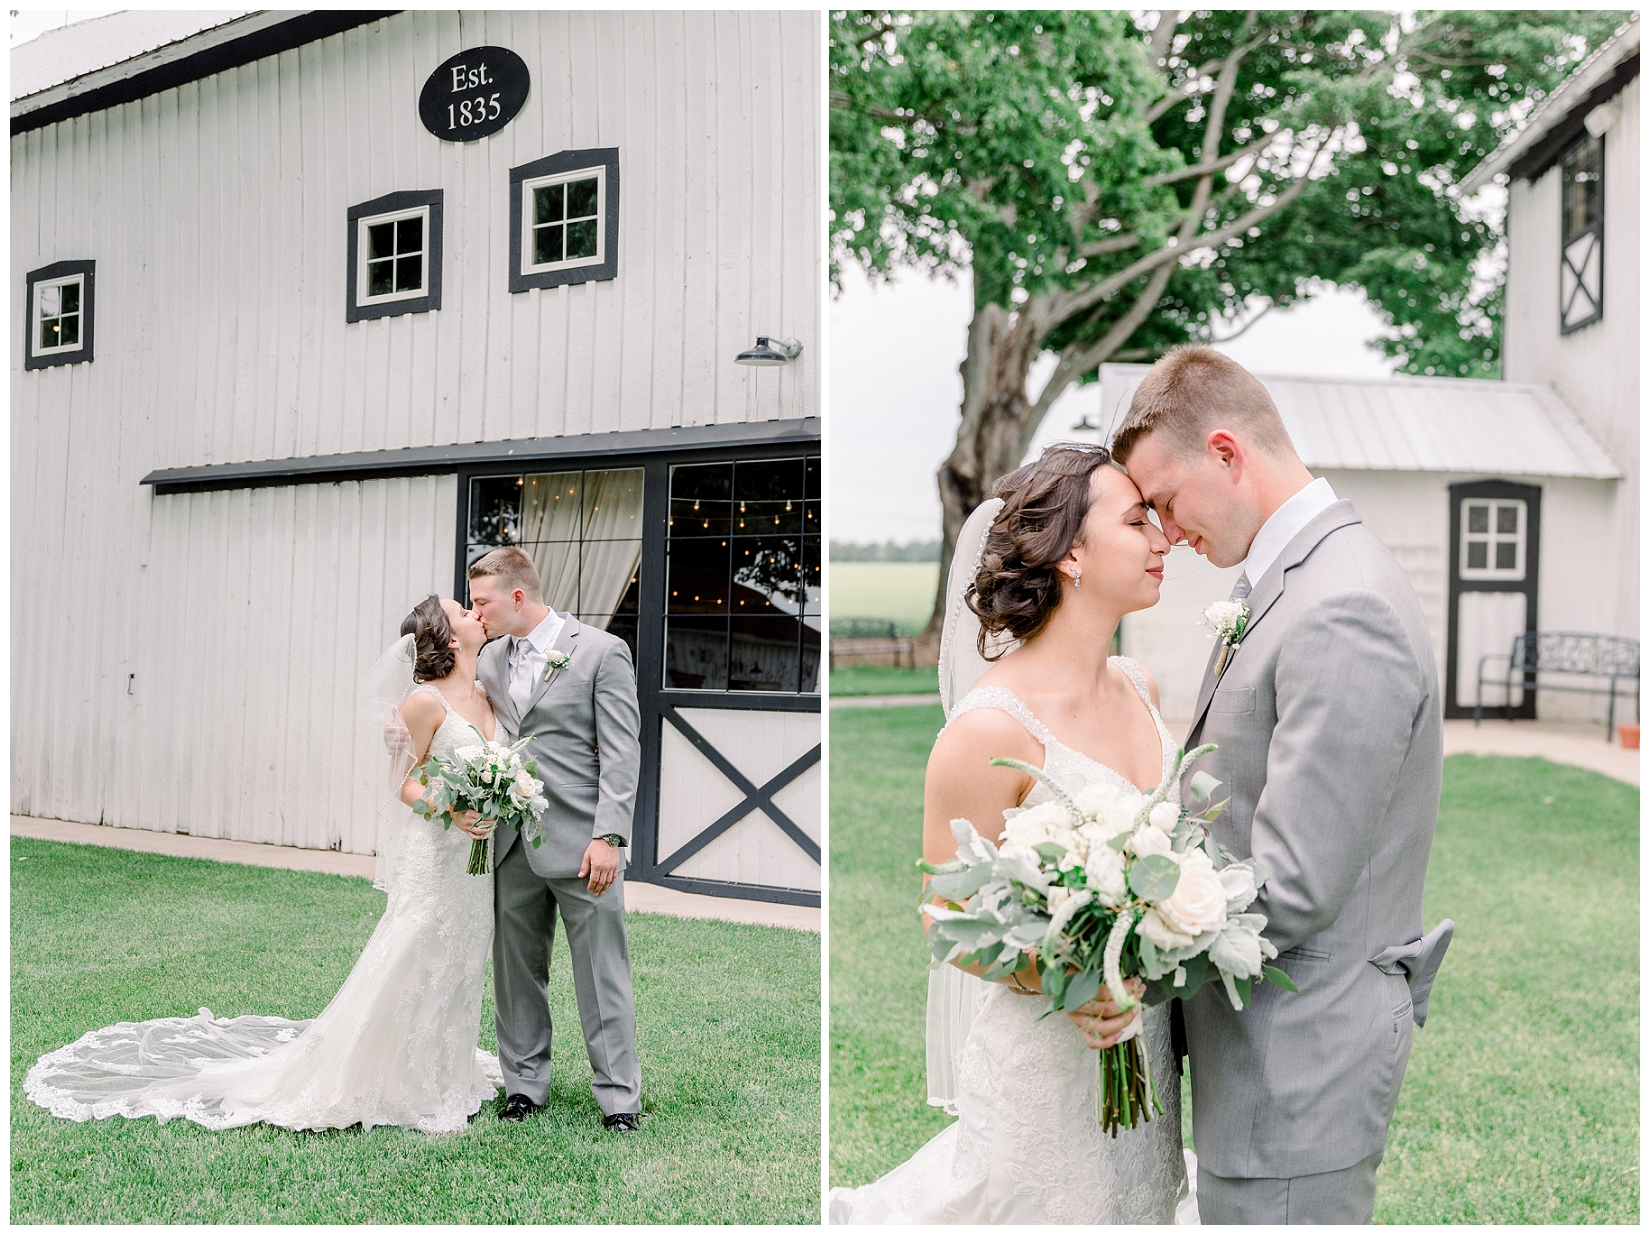 the homestead 1835 wedding_0011.jpg